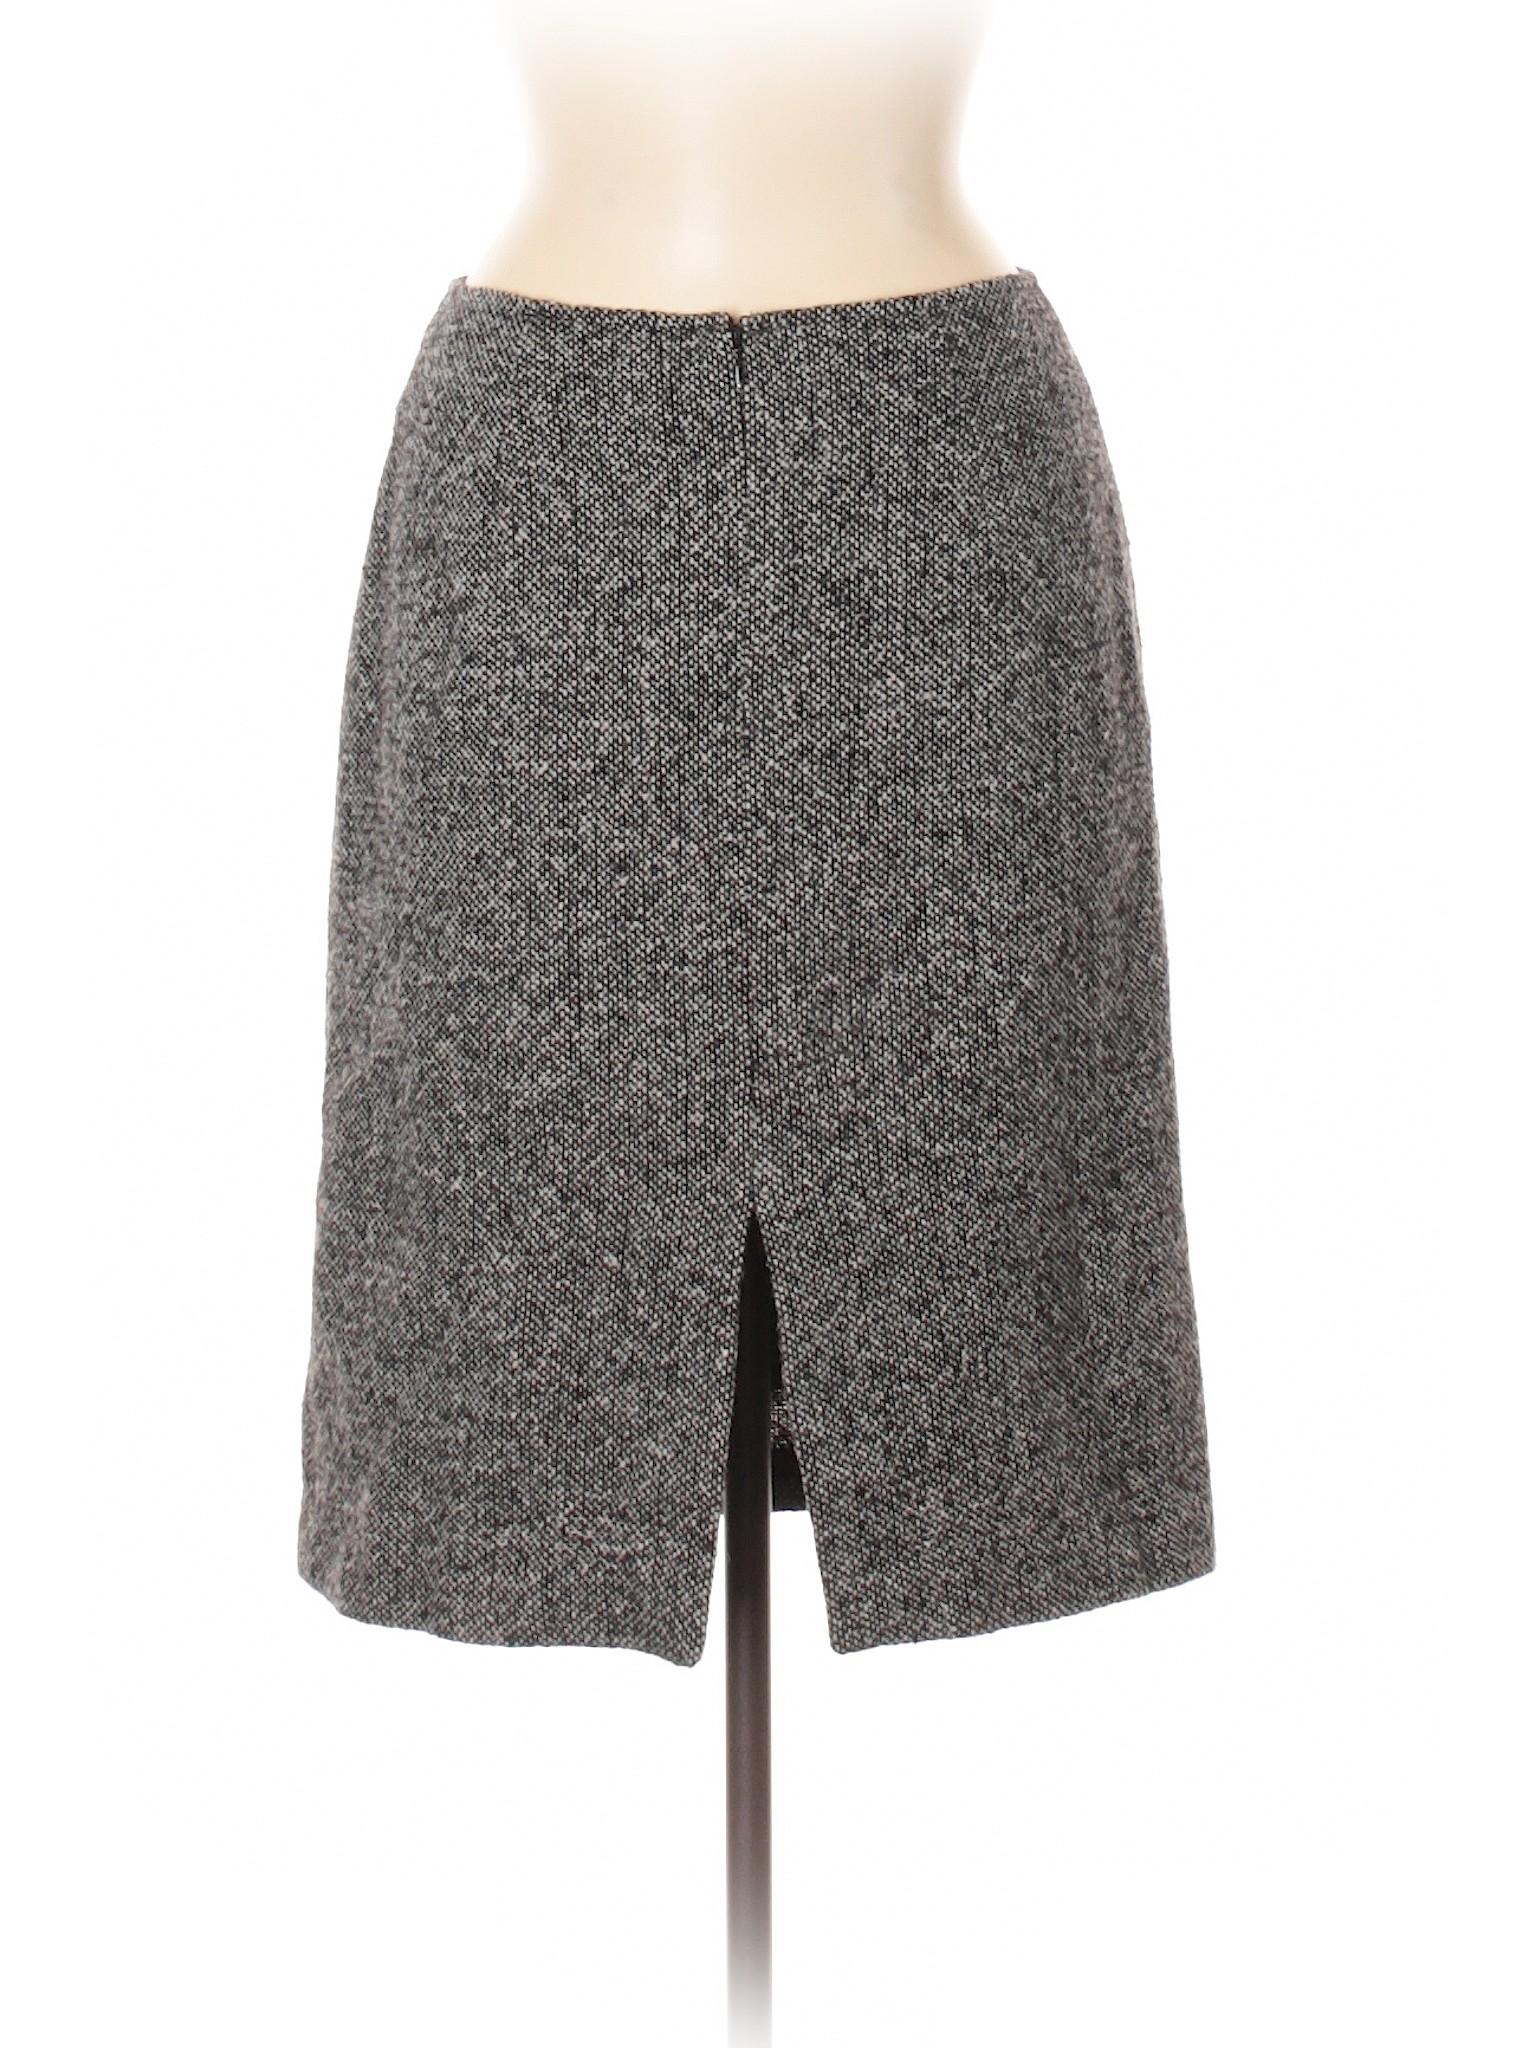 Skirt Casual Skirt Skirt Boutique Casual Boutique Casual Boutique Casual Boutique RTfqOxwwv